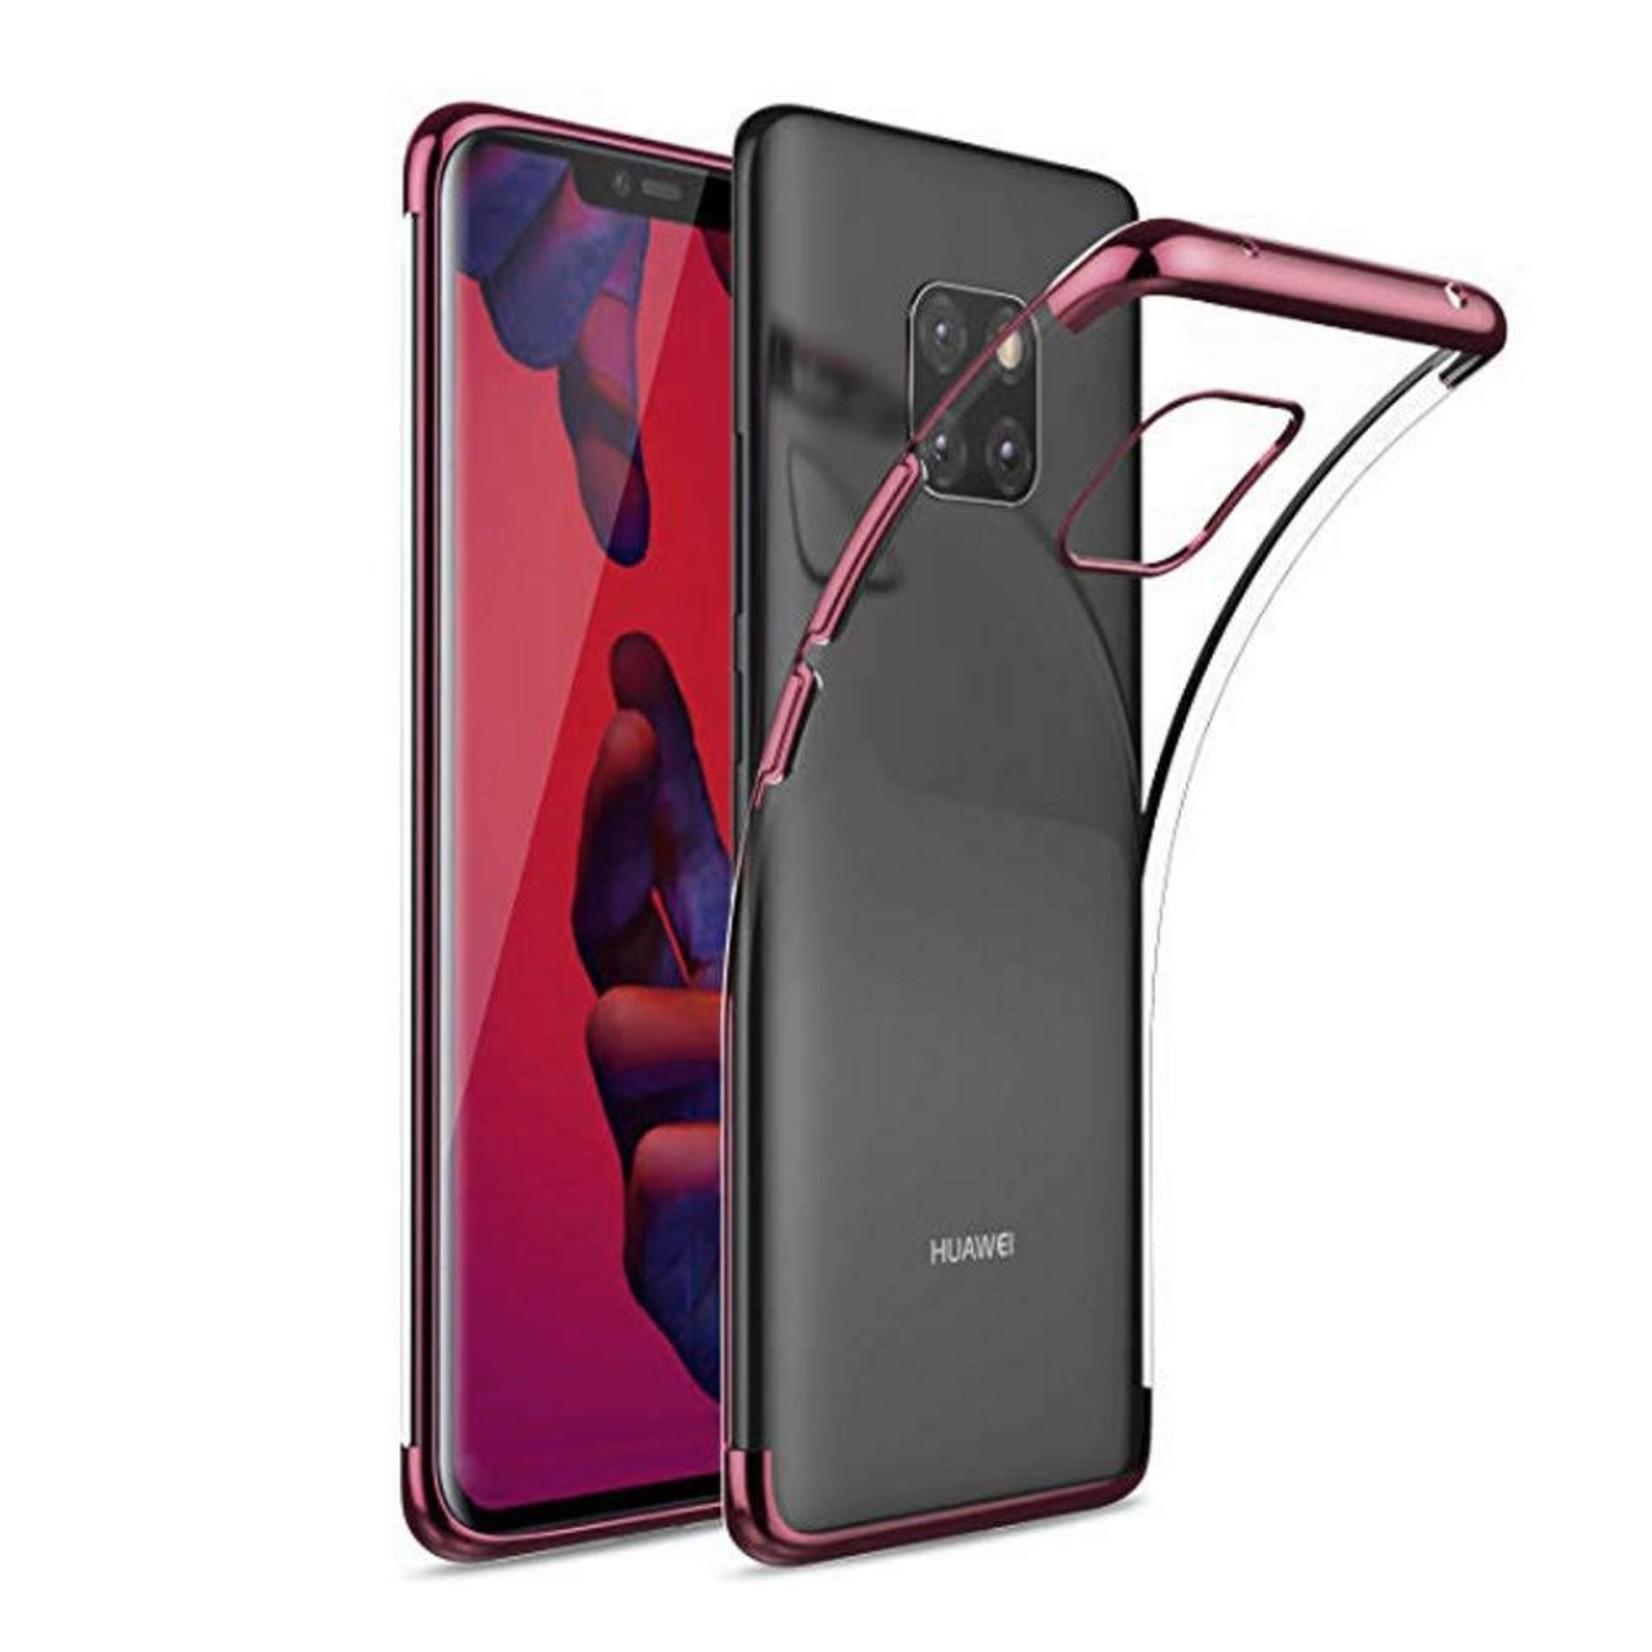 Colorfone Hoesje CoolSkin Bumper Clear voor Huawei Mate 20 Pro Rosé Goud